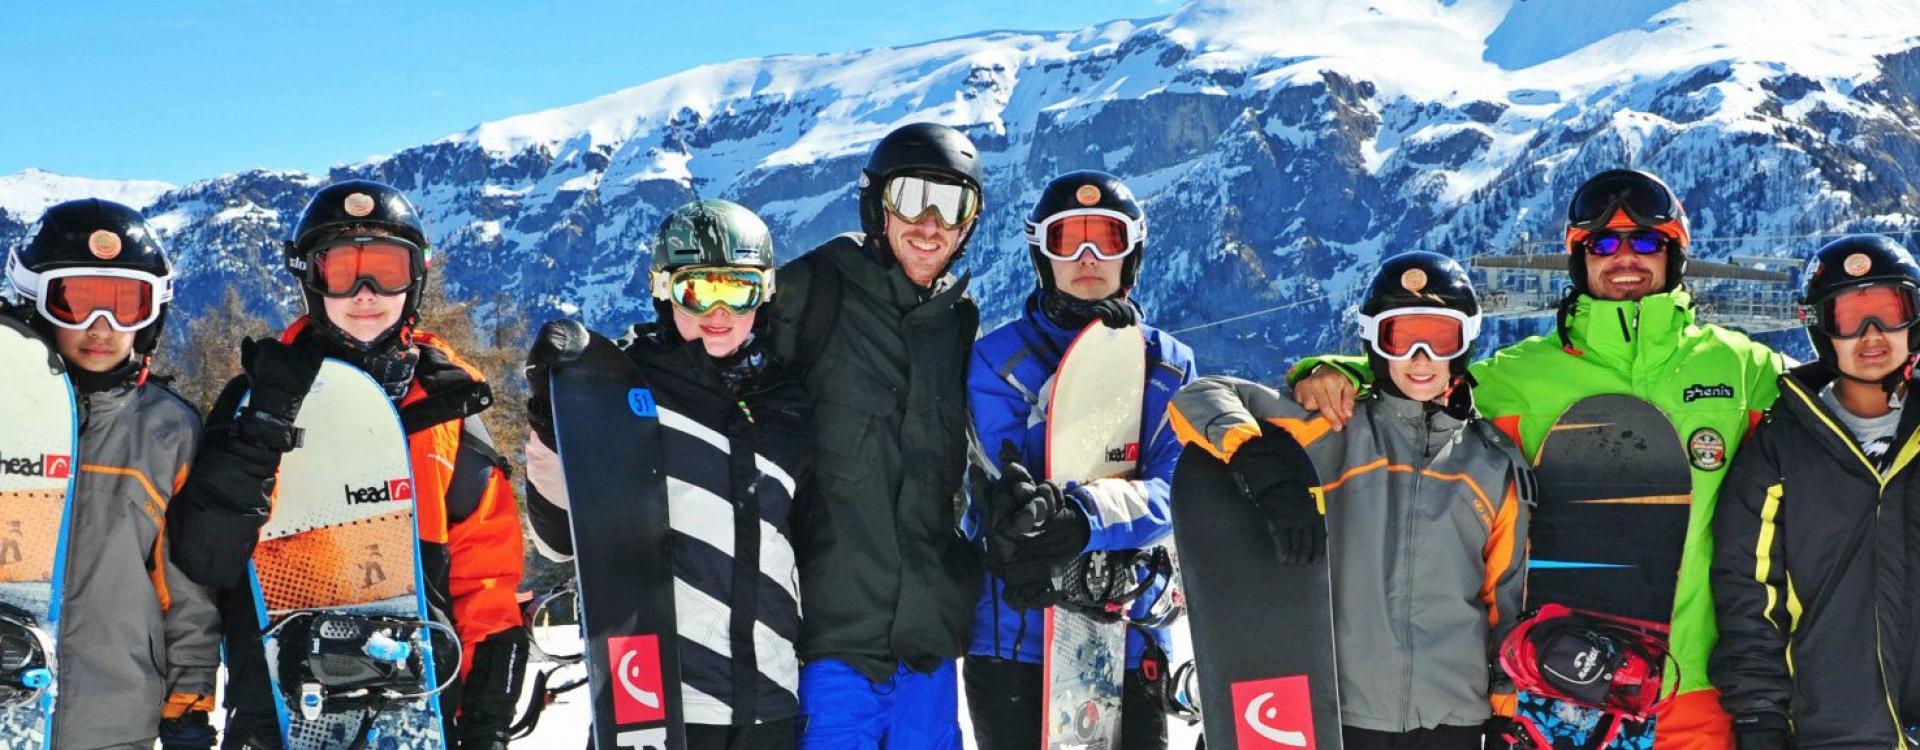 corso-snowboard-folgarida